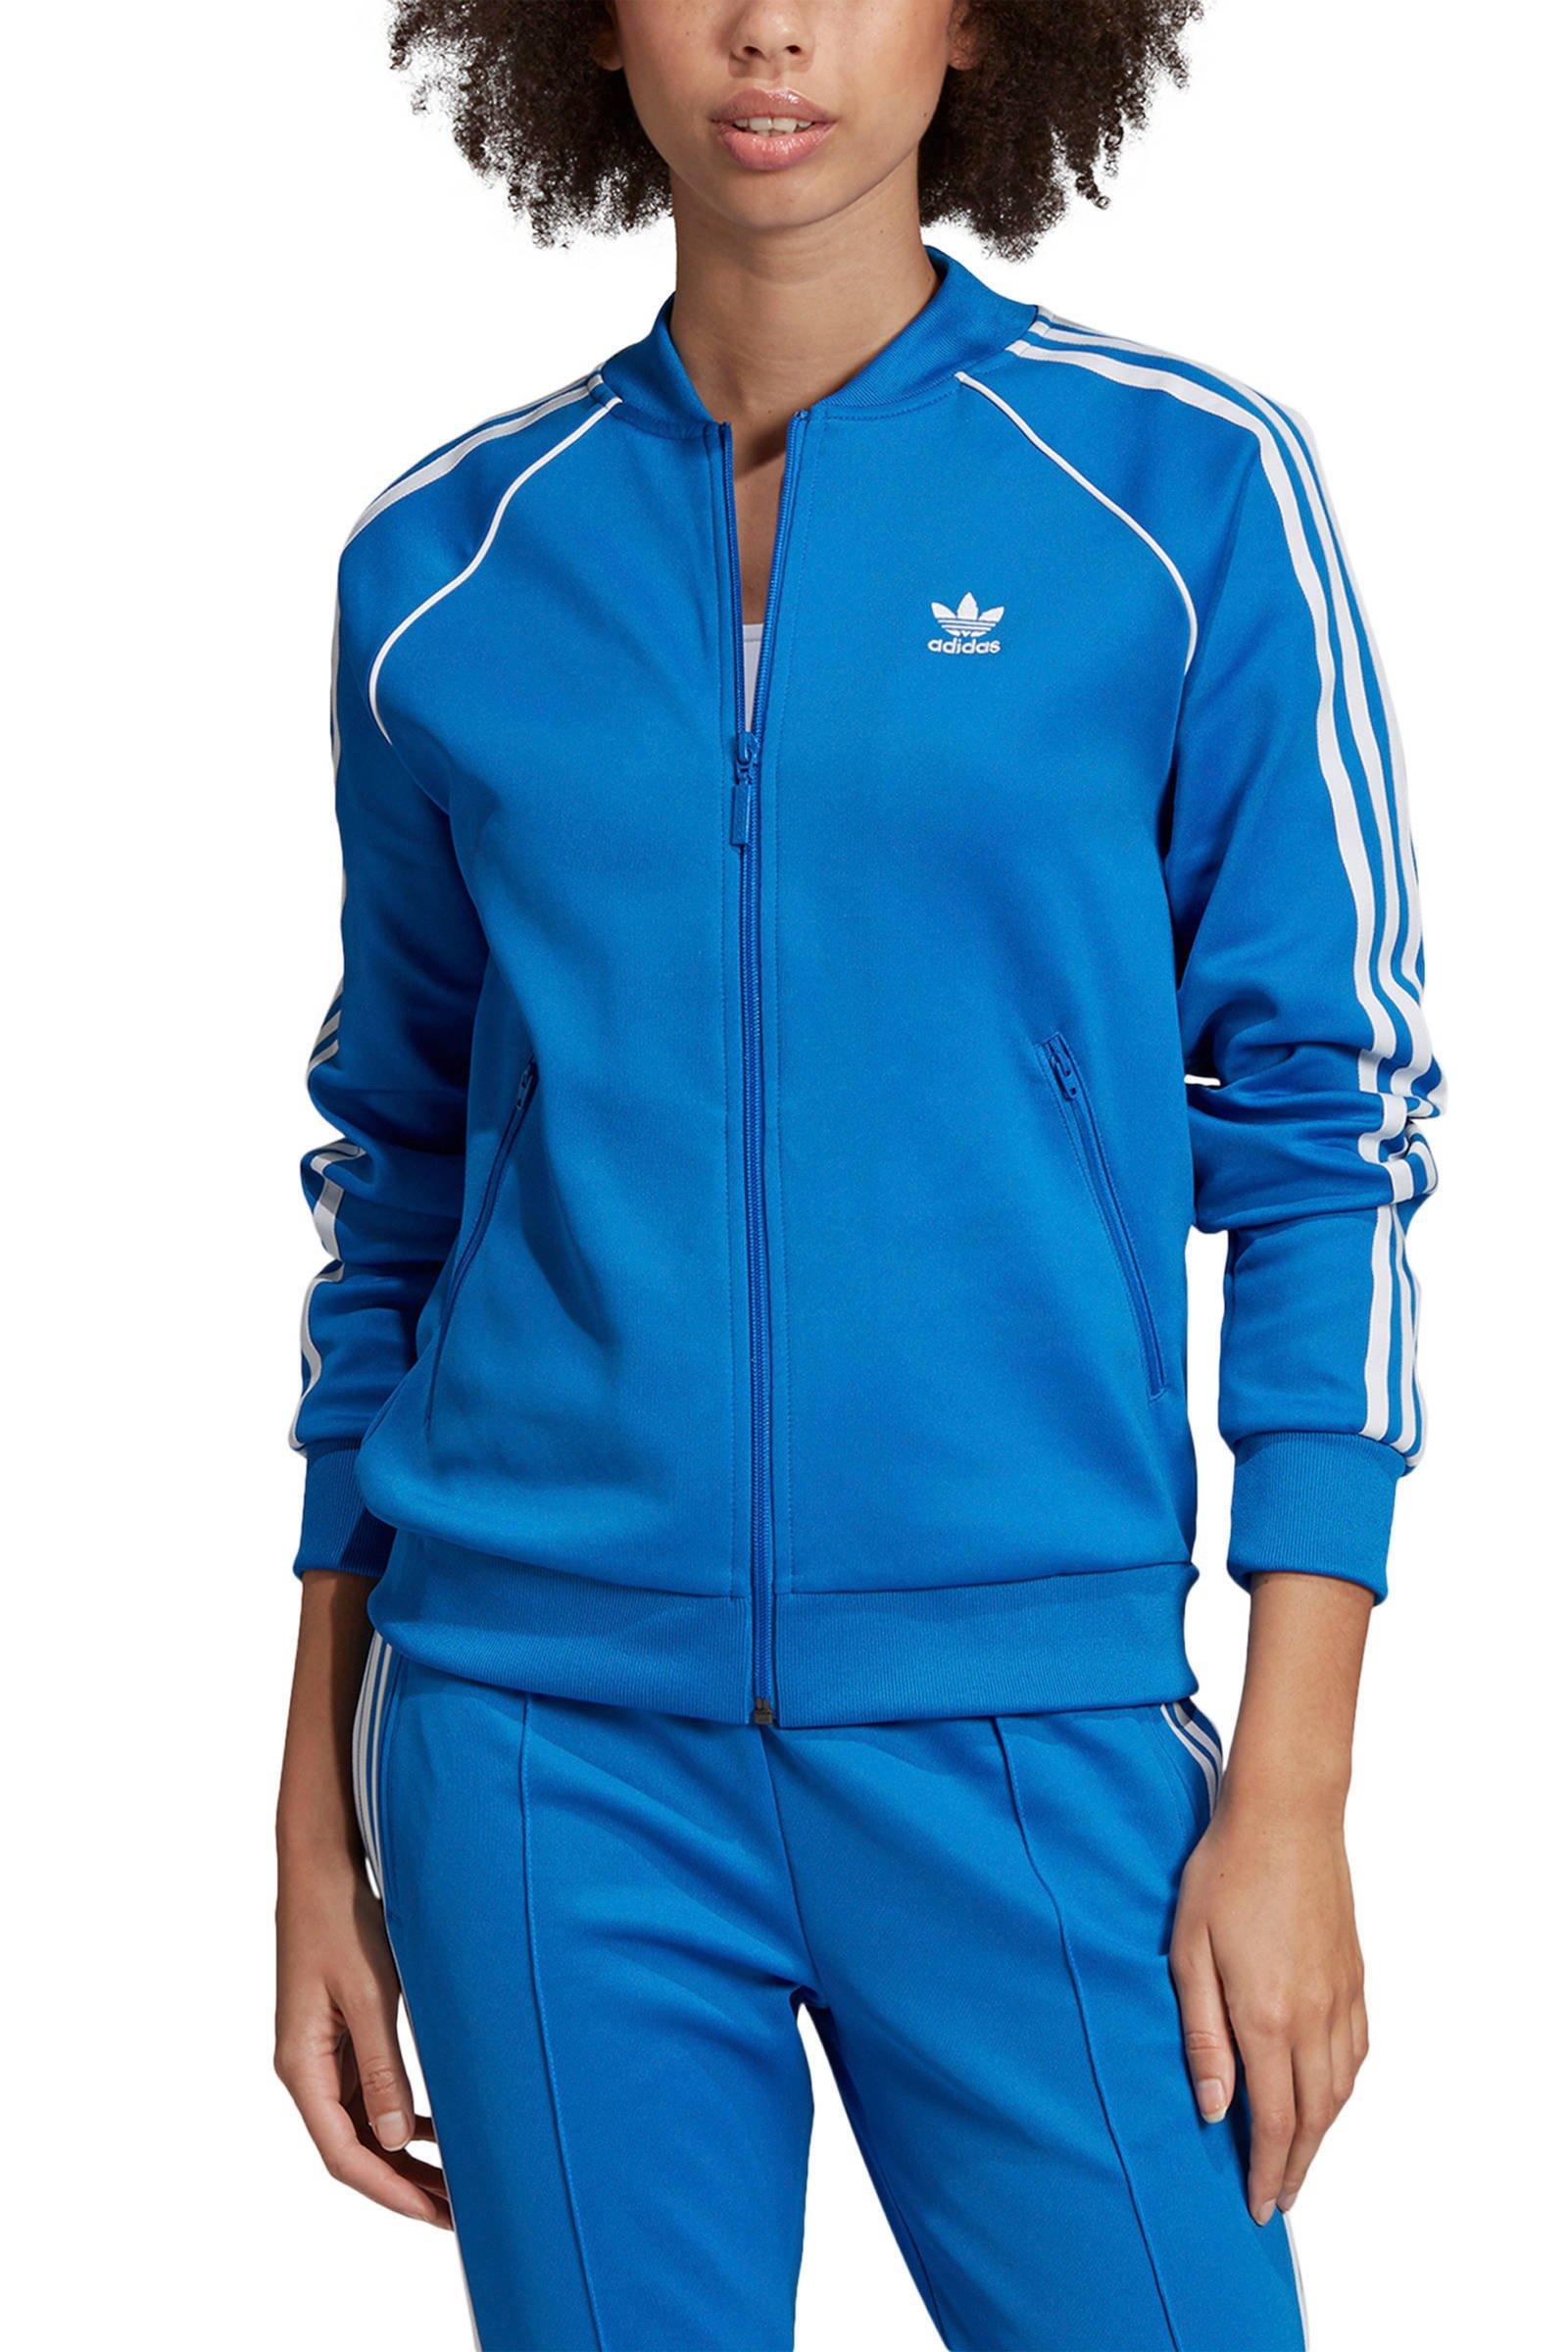 blauw adidas vest dames